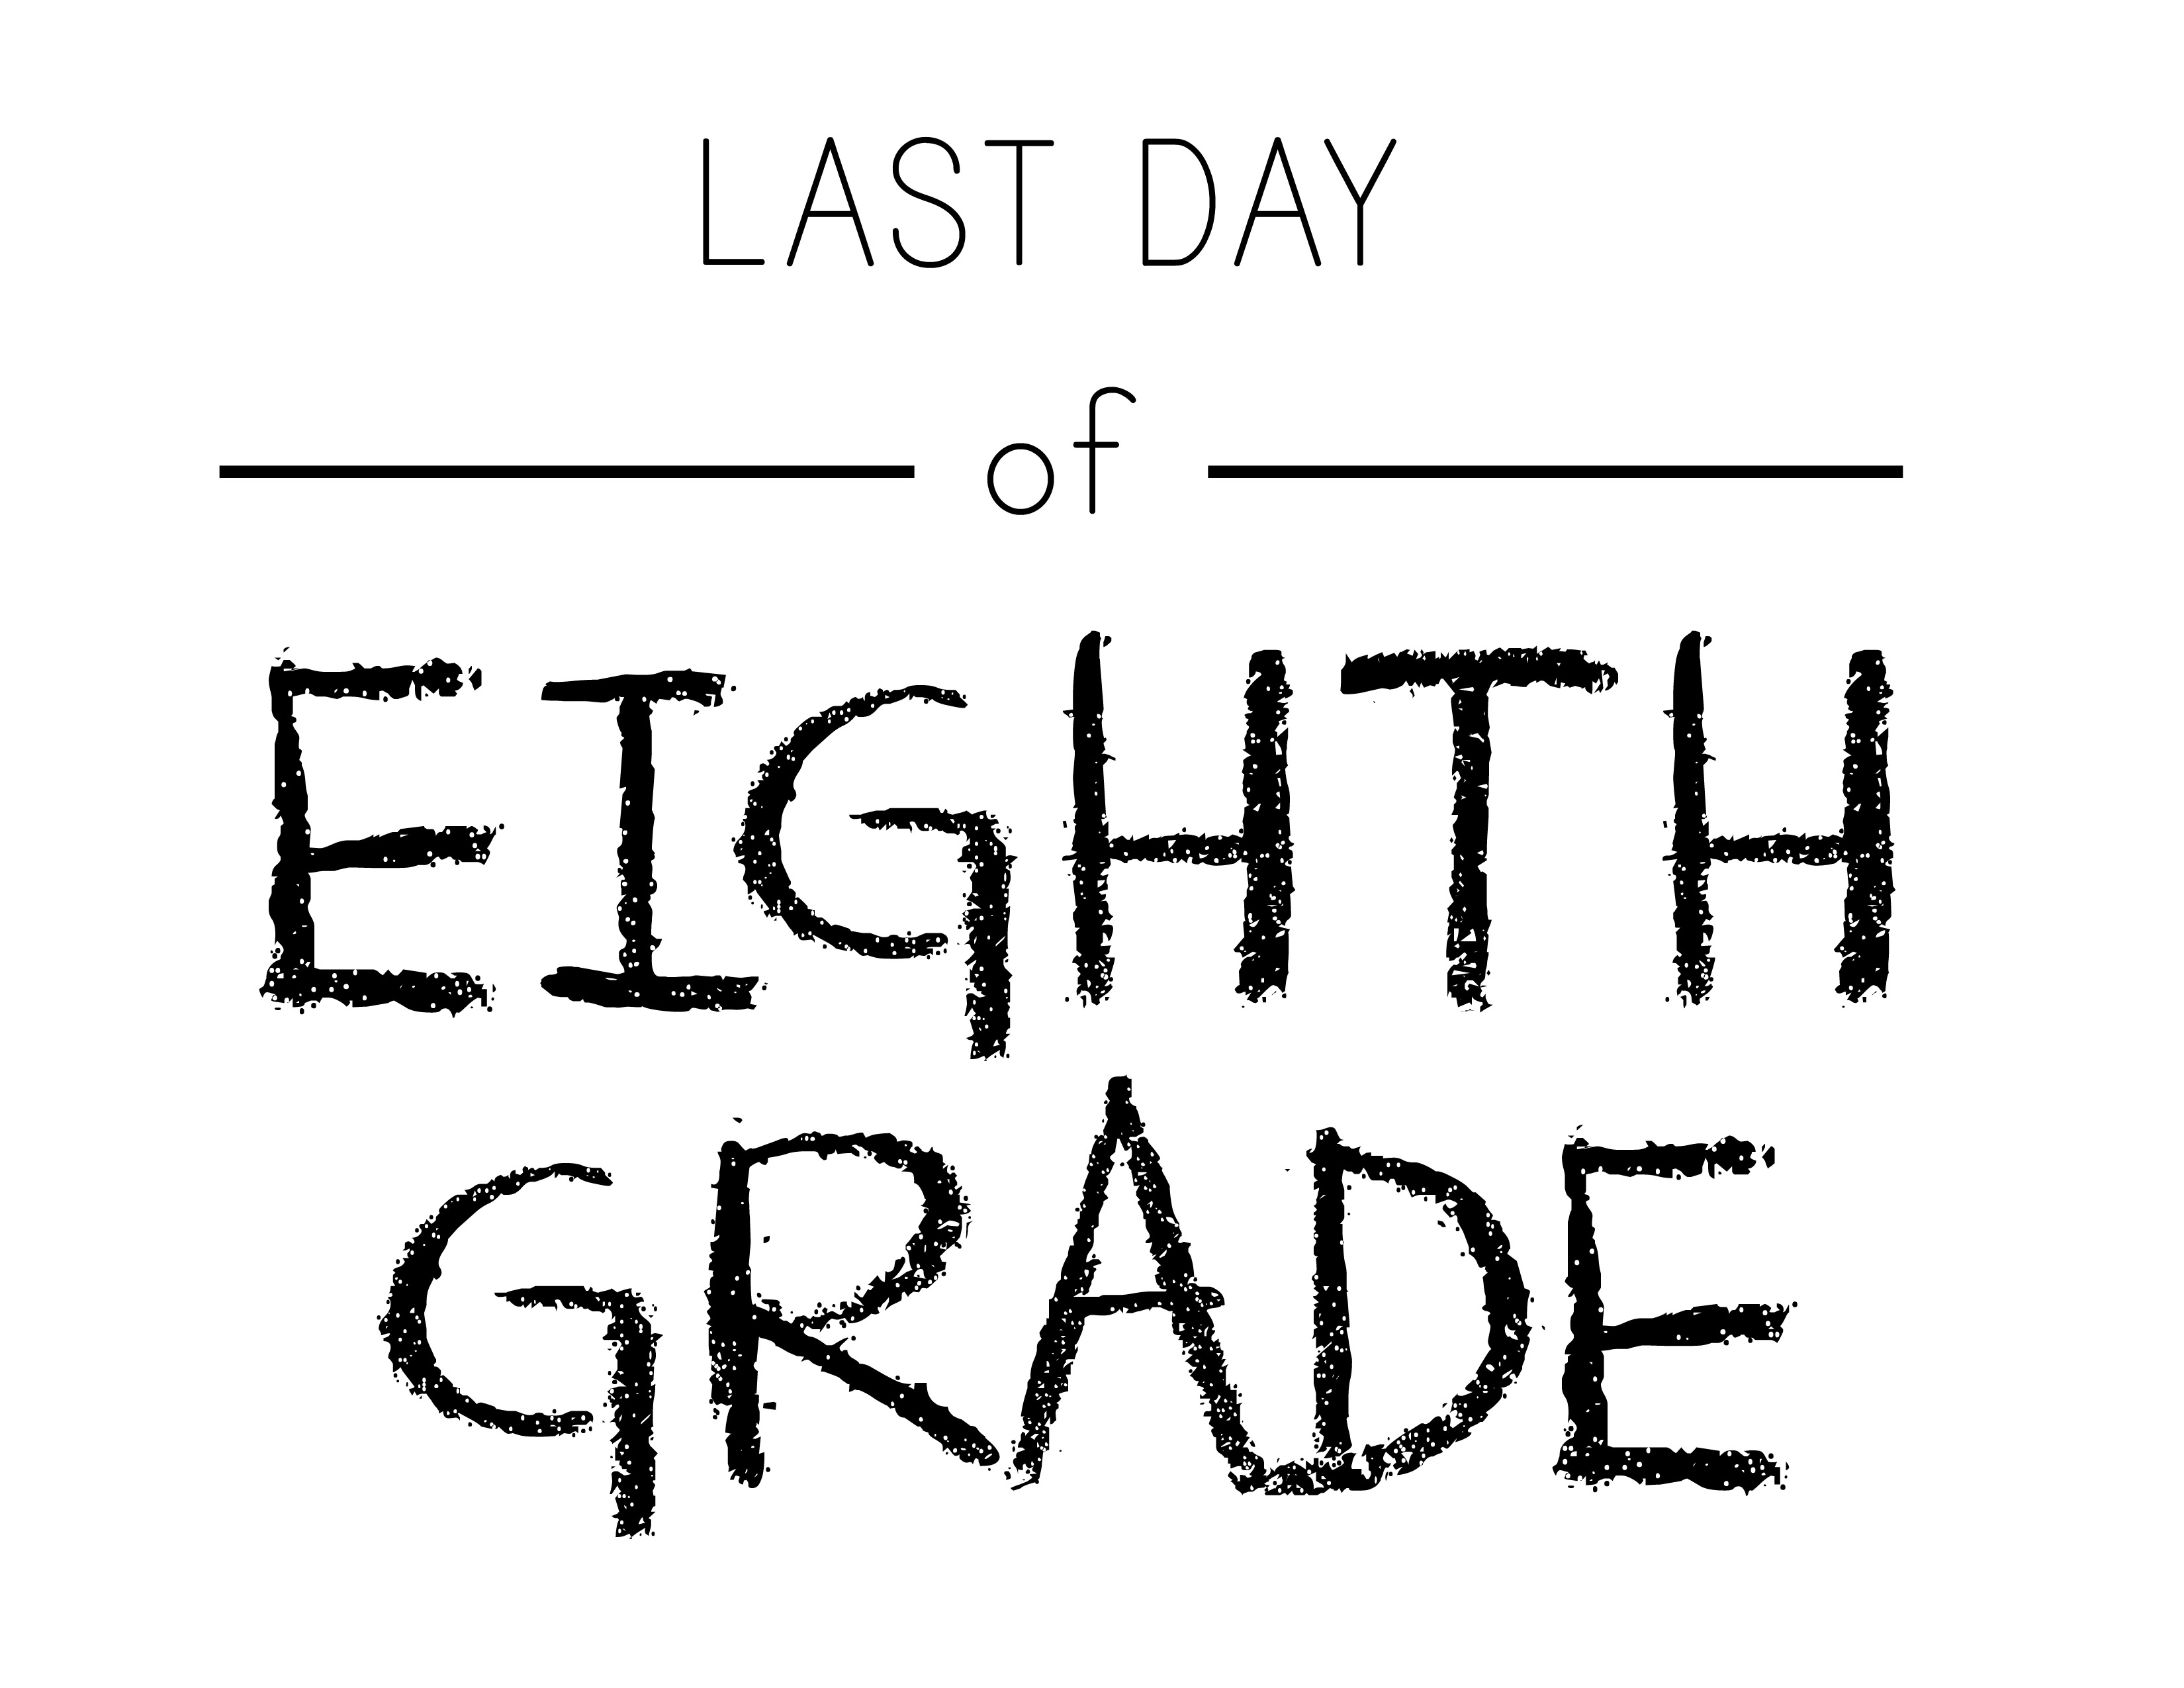 Free th cliparts download. Graduation clipart 8th grade graduation